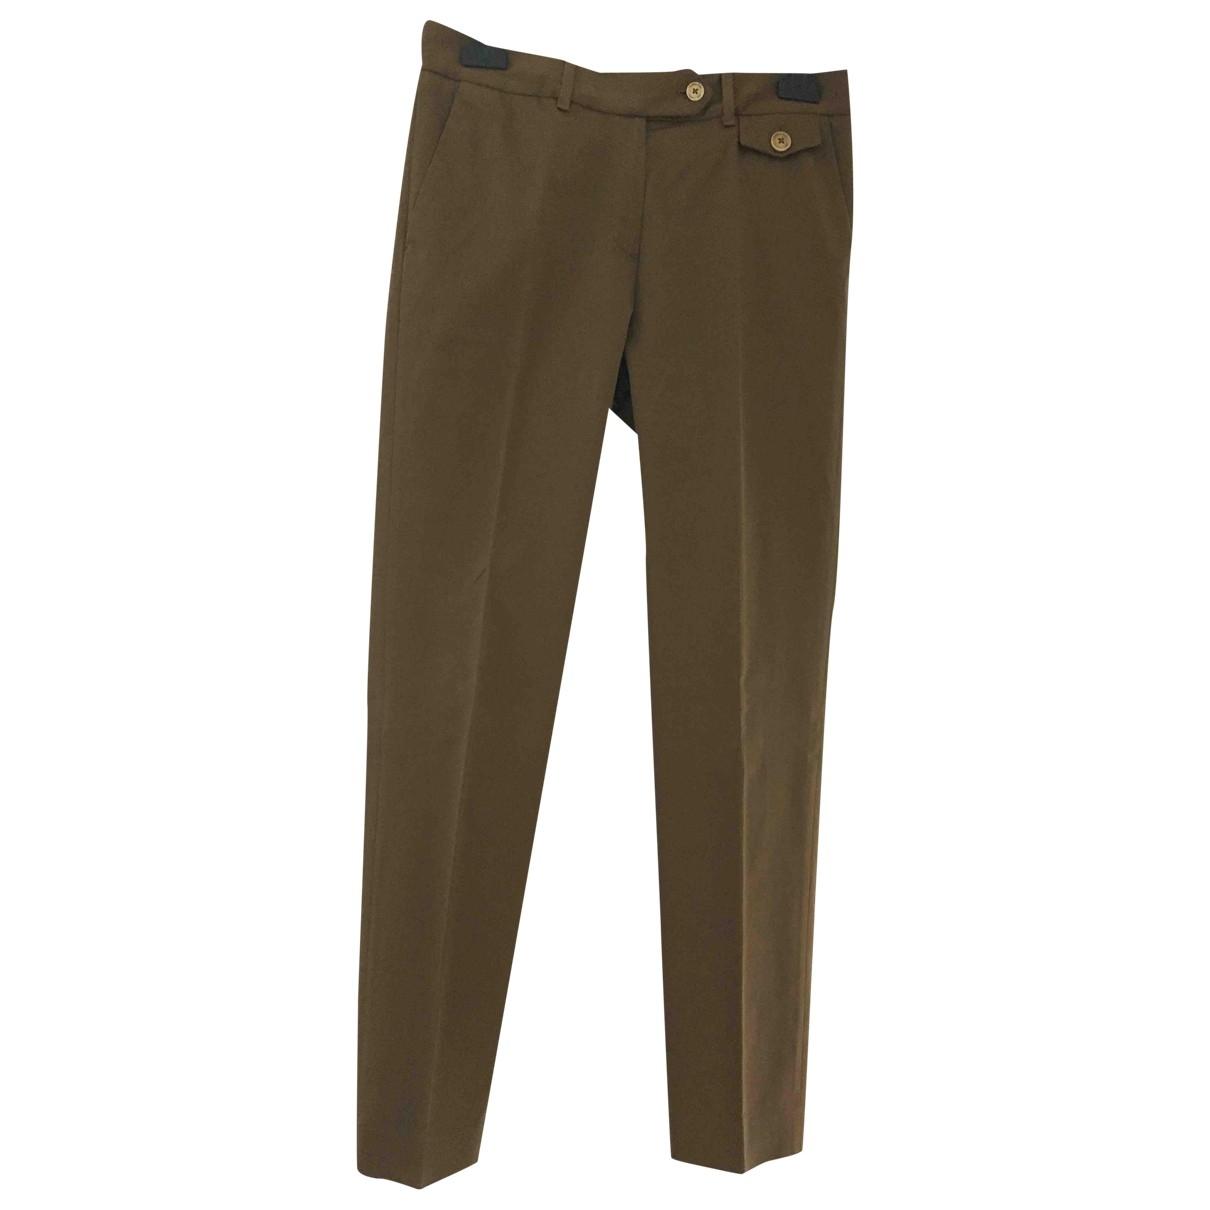 Massimo Dutti - Pantalon   pour femme en coton - marron